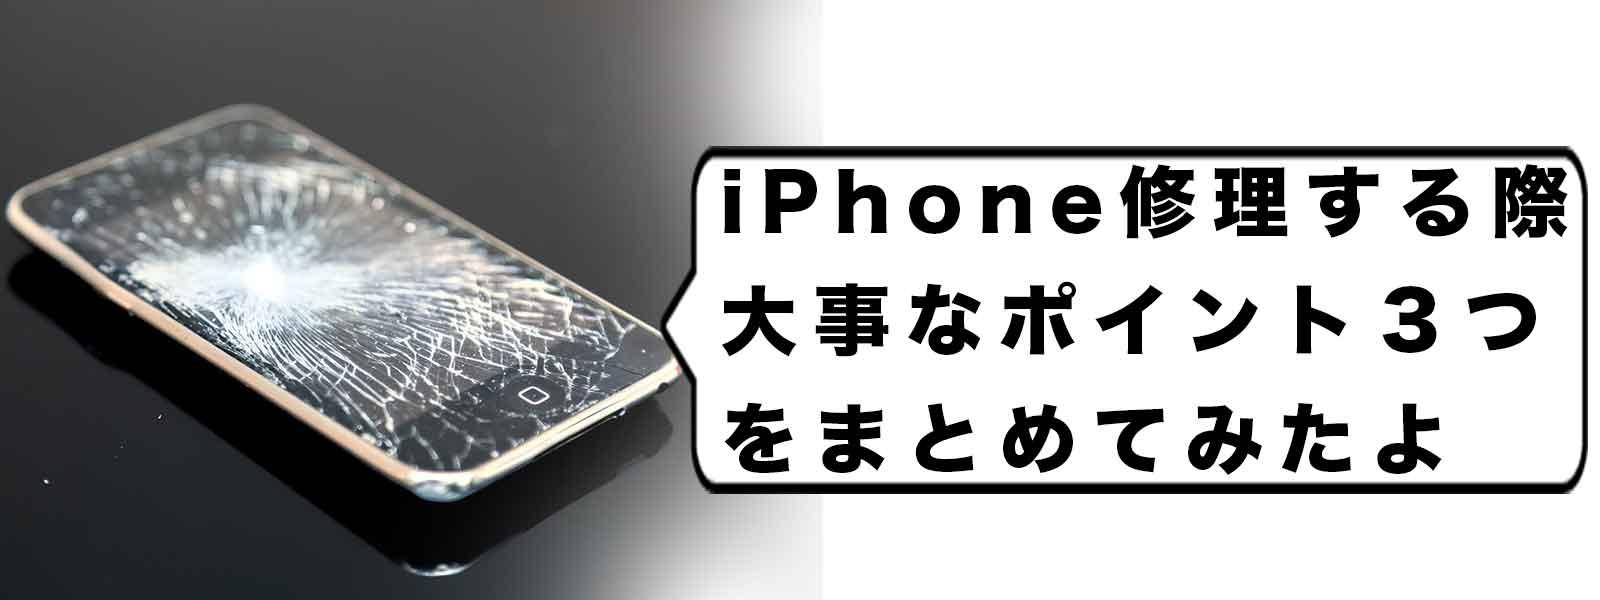 iPhone修理するときに大事なポイント3つをまとめました。